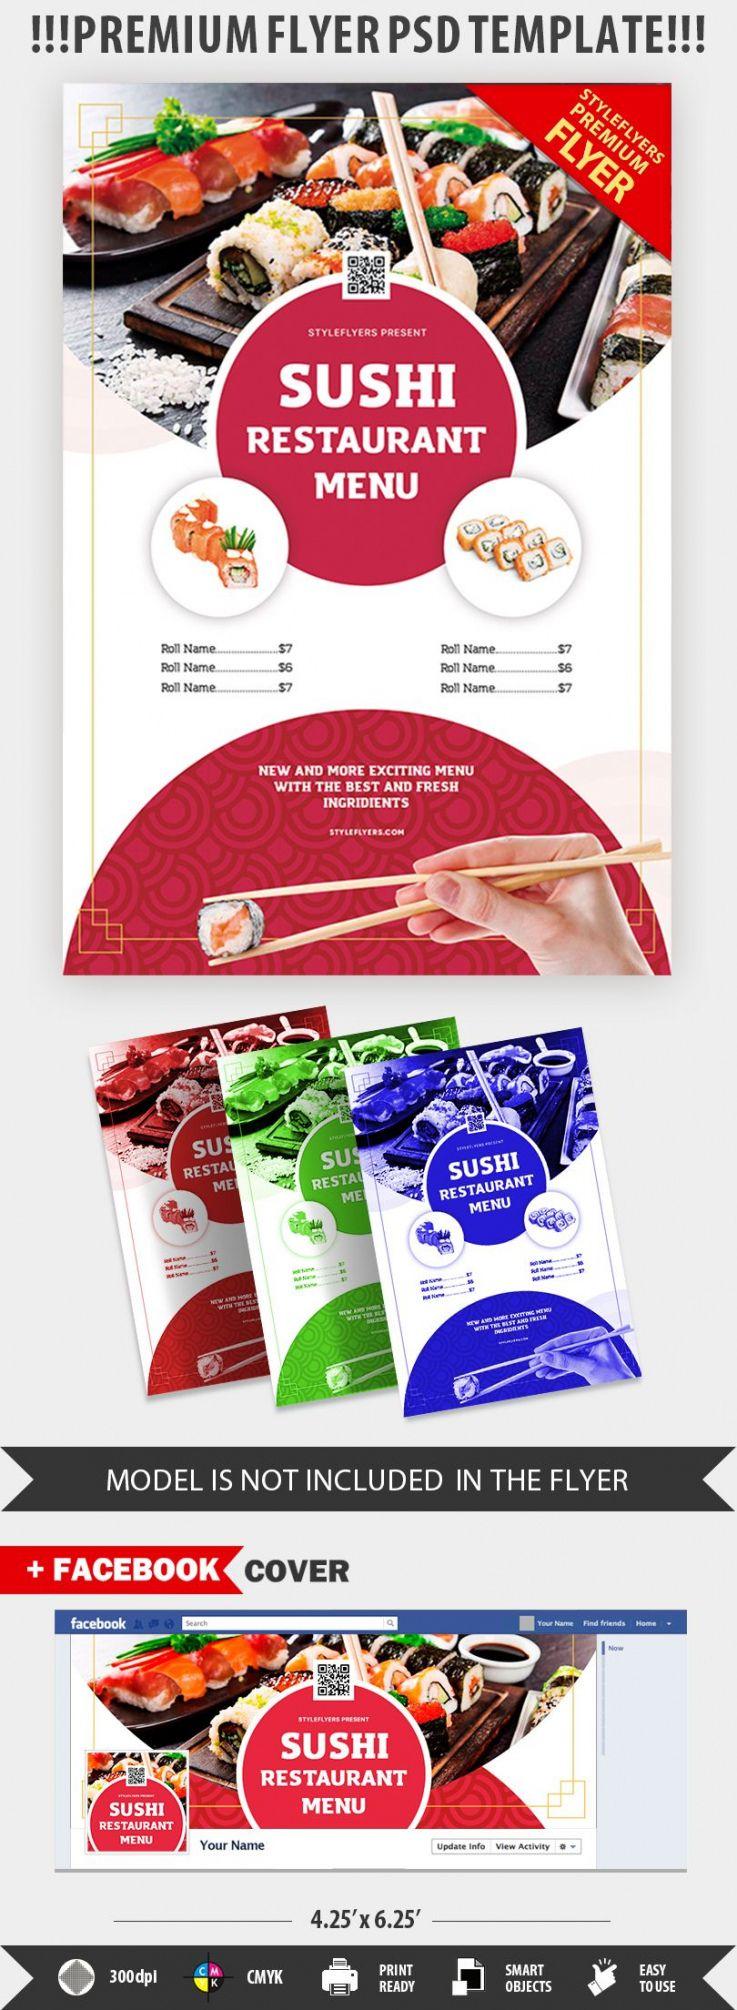 sample sushi restaurant menu psd flyer template 30164  styleflyers soul food menu template pdf